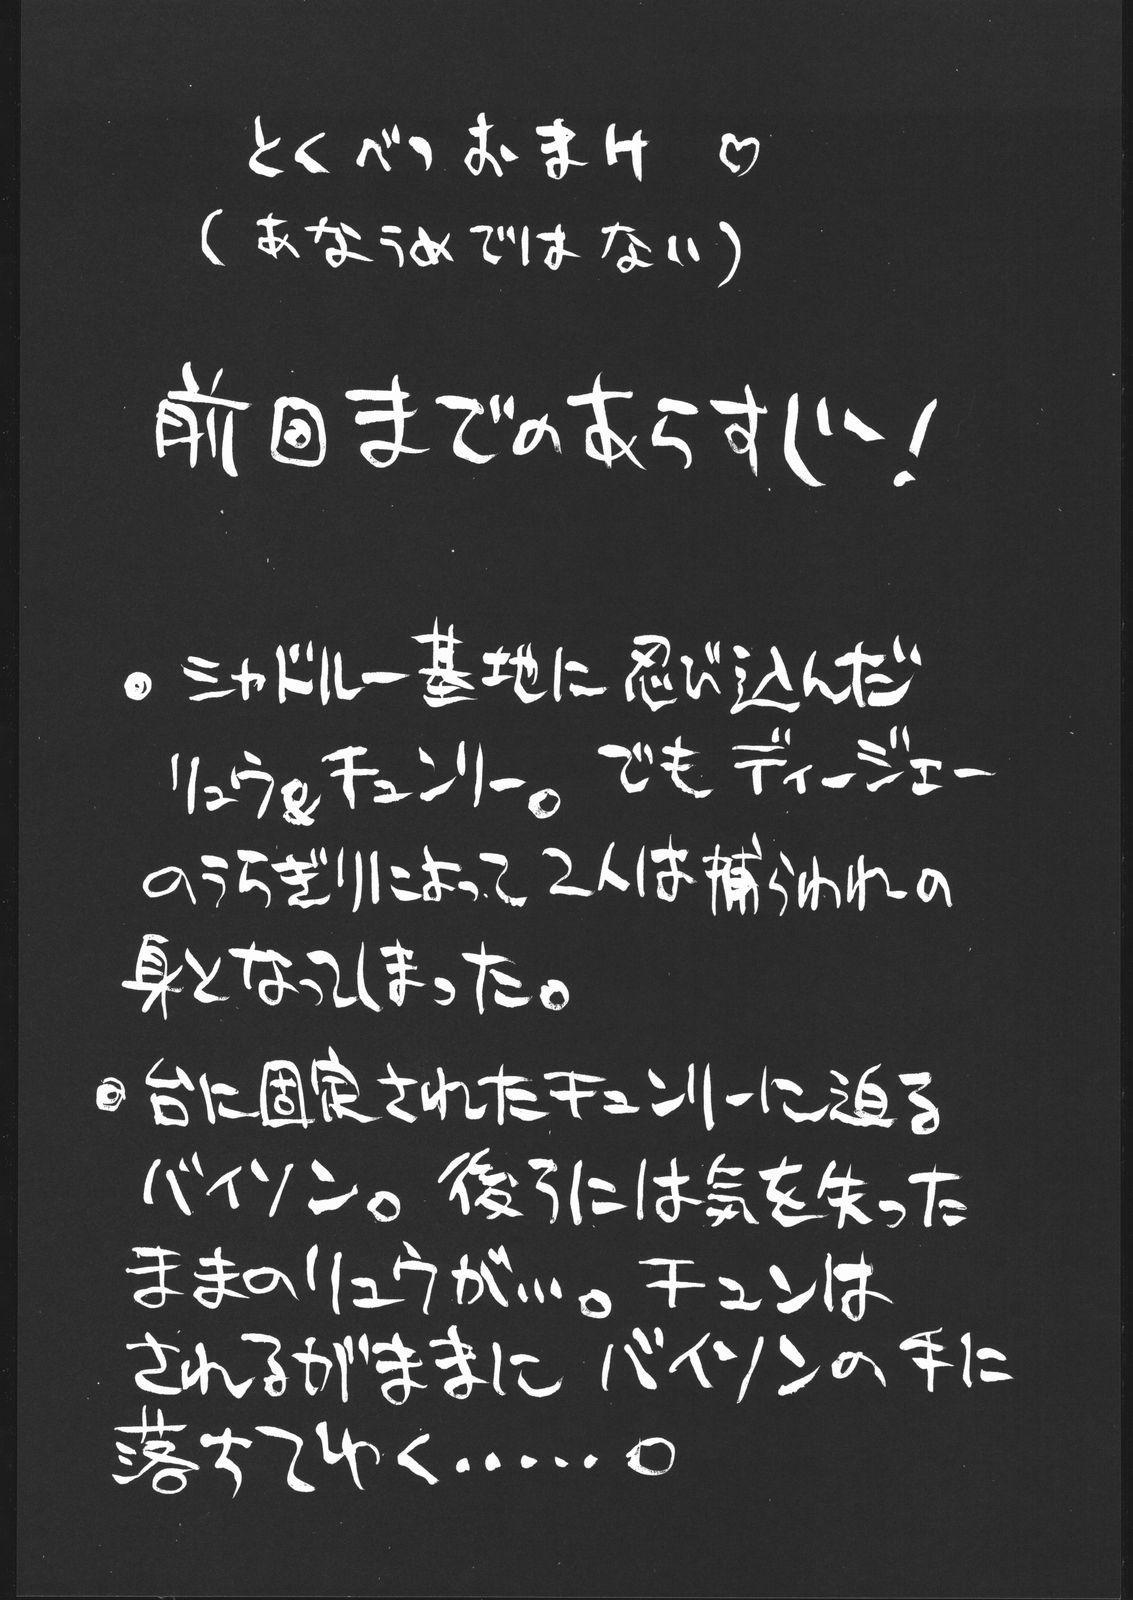 kakutou geemu hon 39